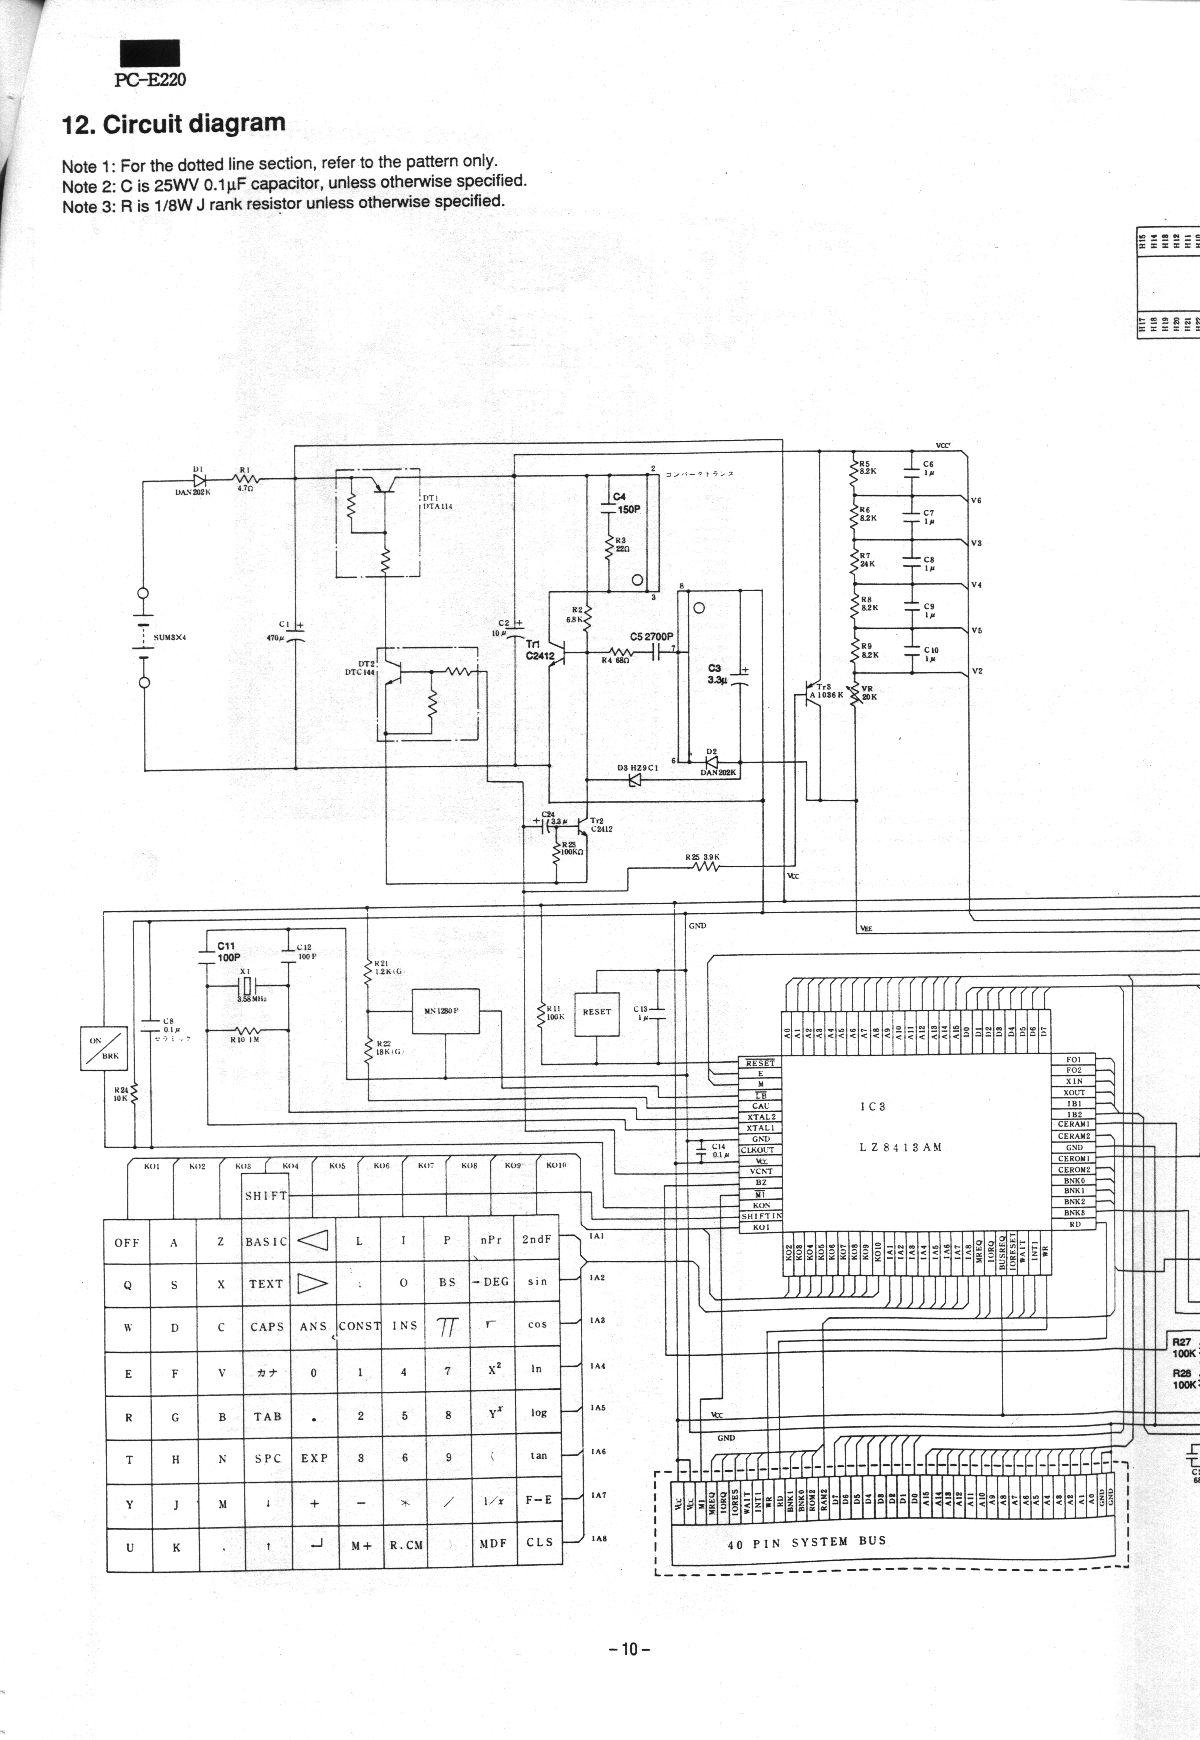 Listing Of Achim Pc E220 Note 2 Circuit Diagram Service Man10